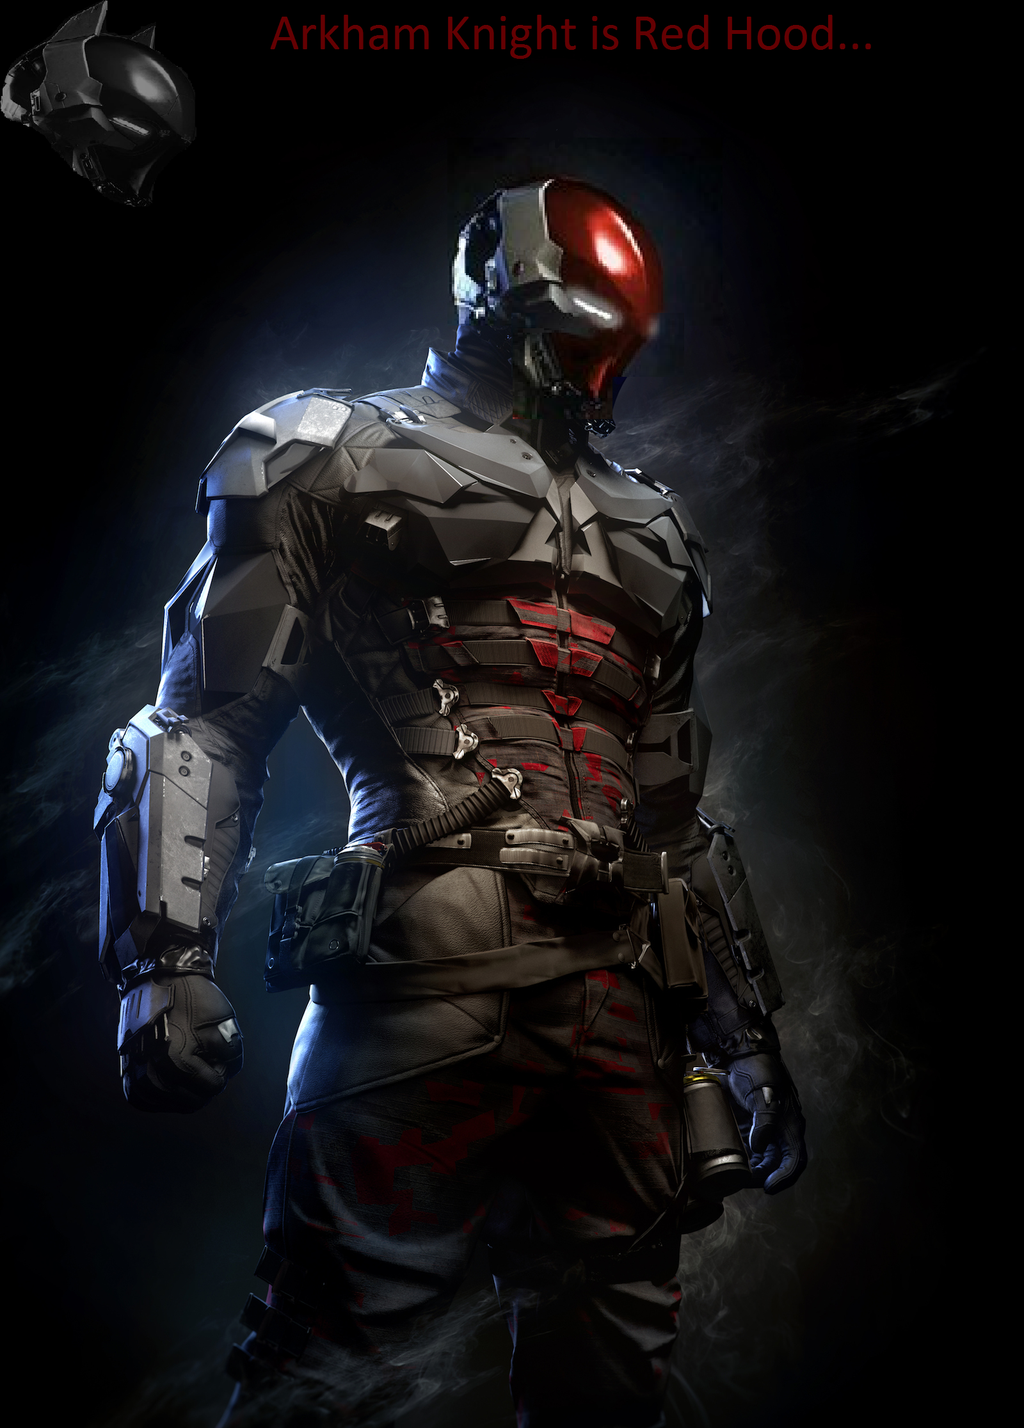 Red Hood Arkham Knight Wallpaper - WallpaperSafari